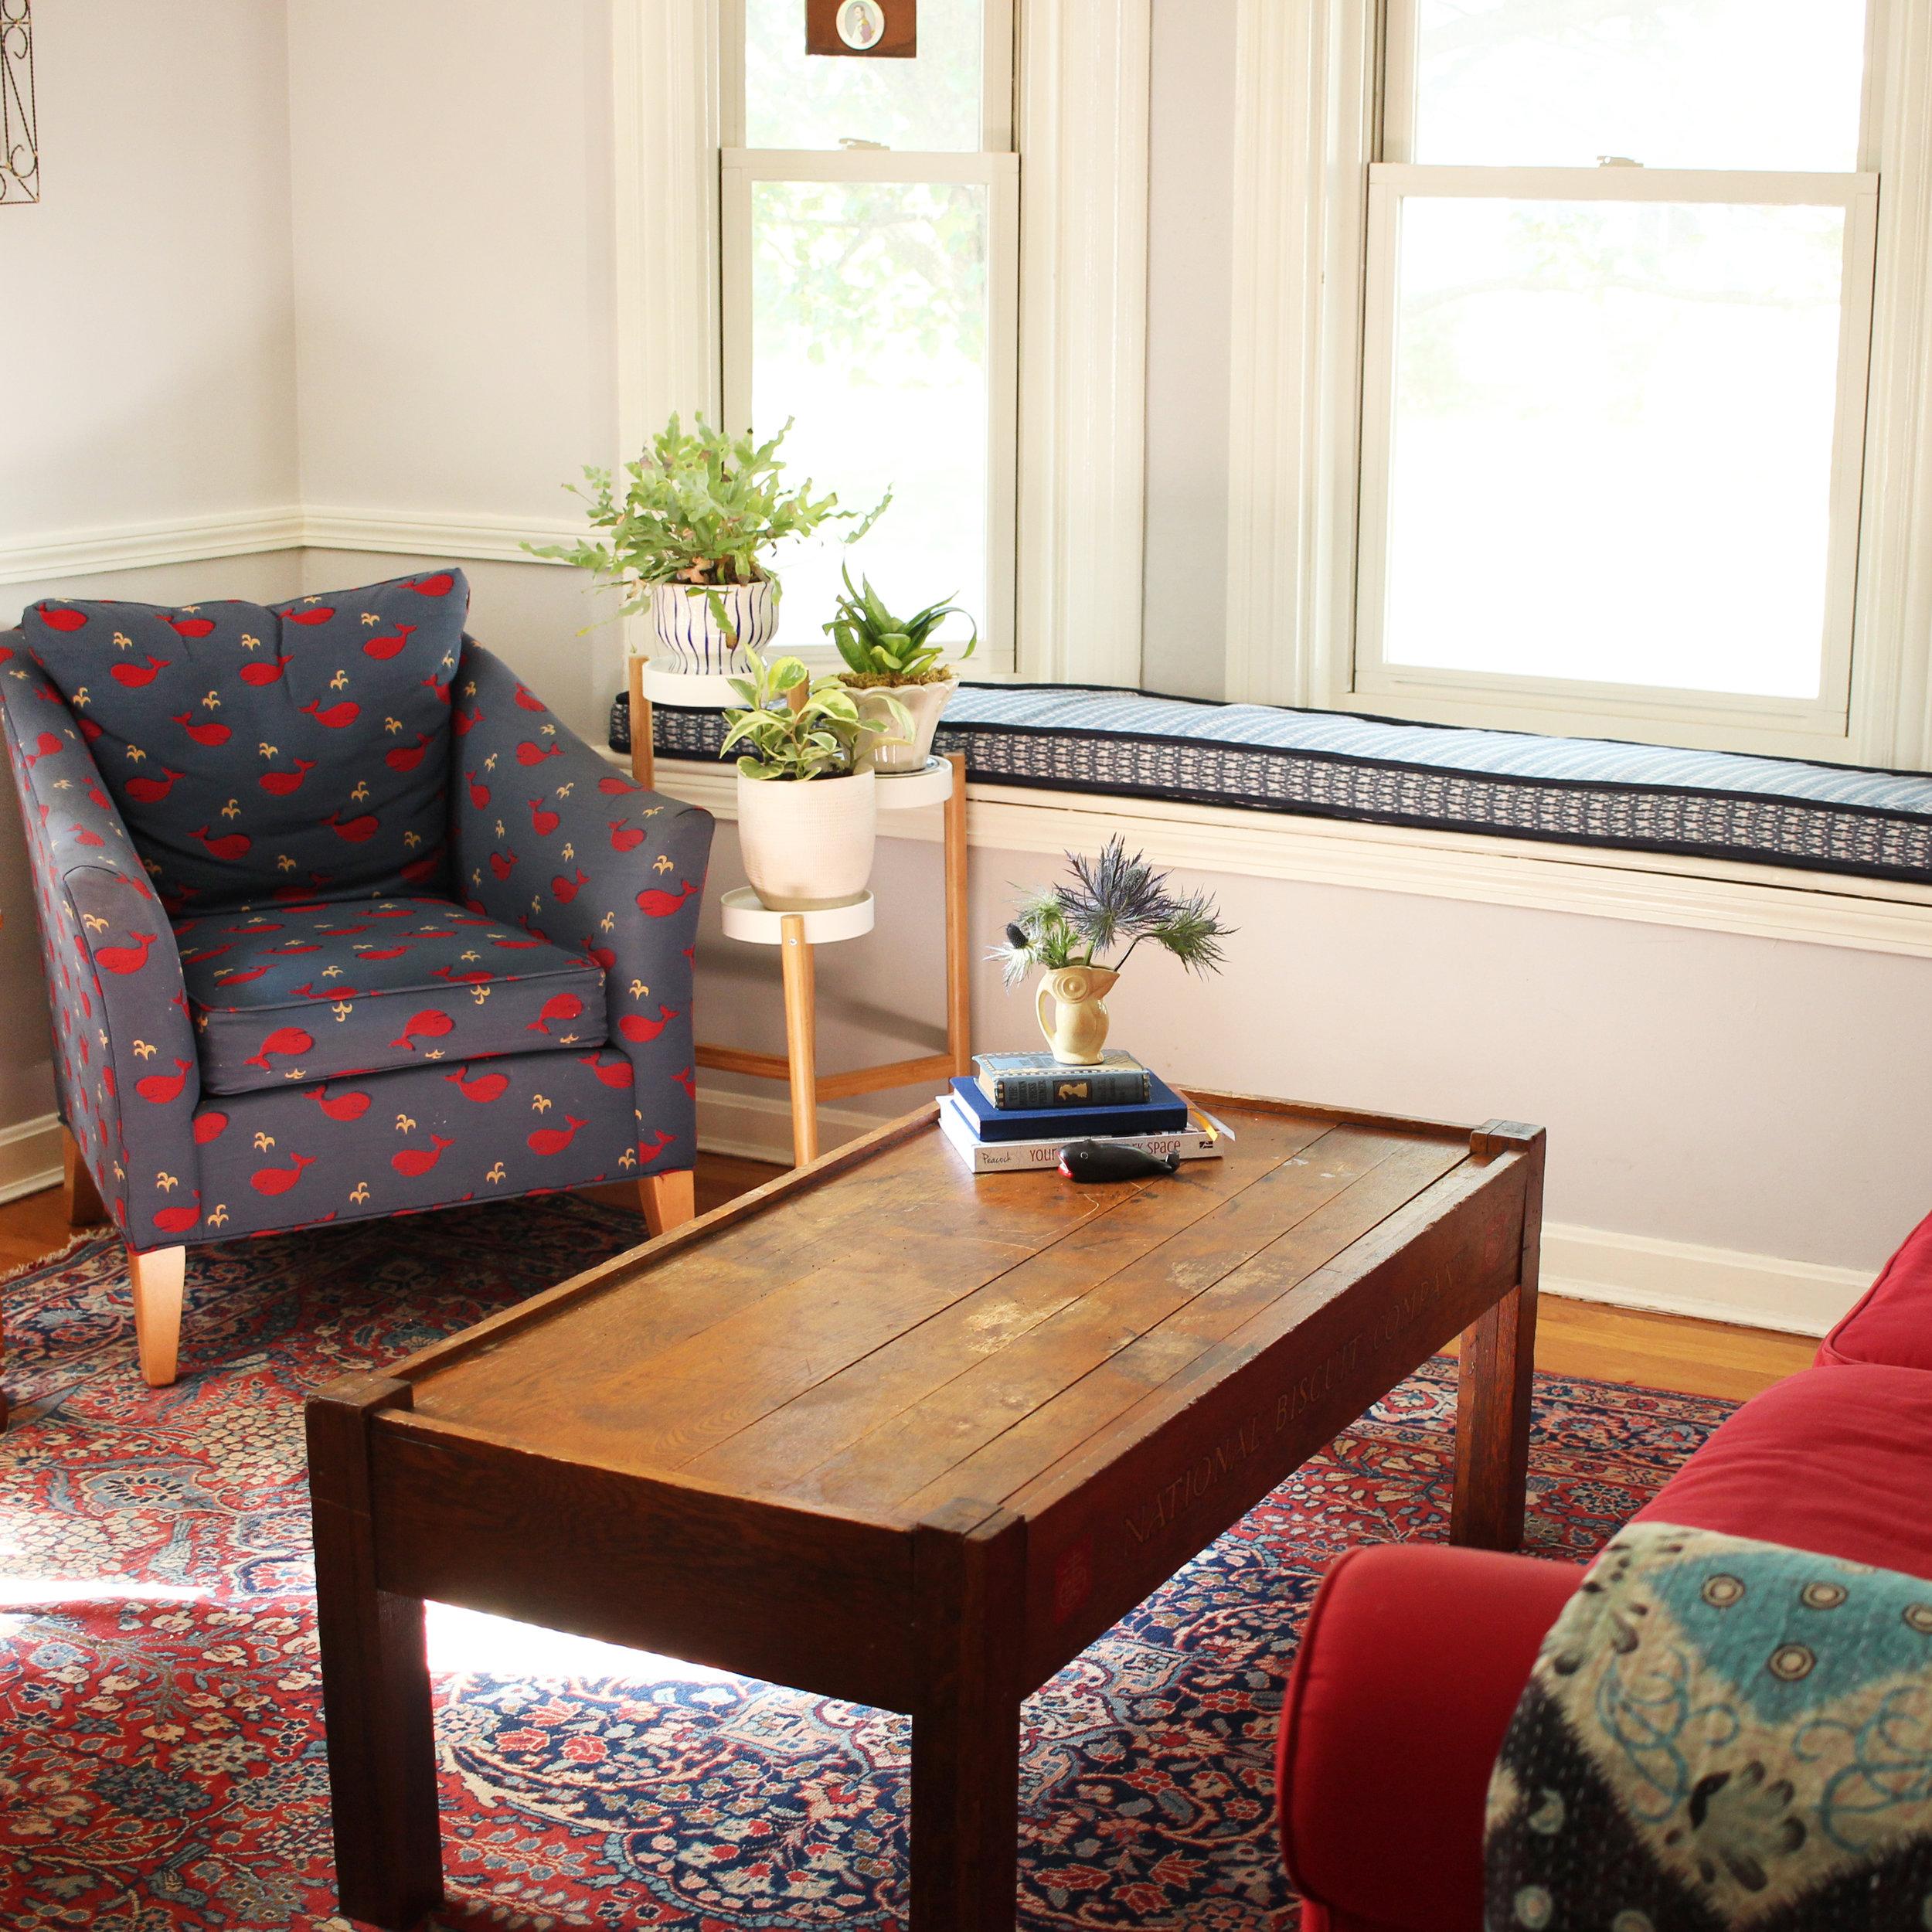 Zandra's new window seat with fabric from Loom Home